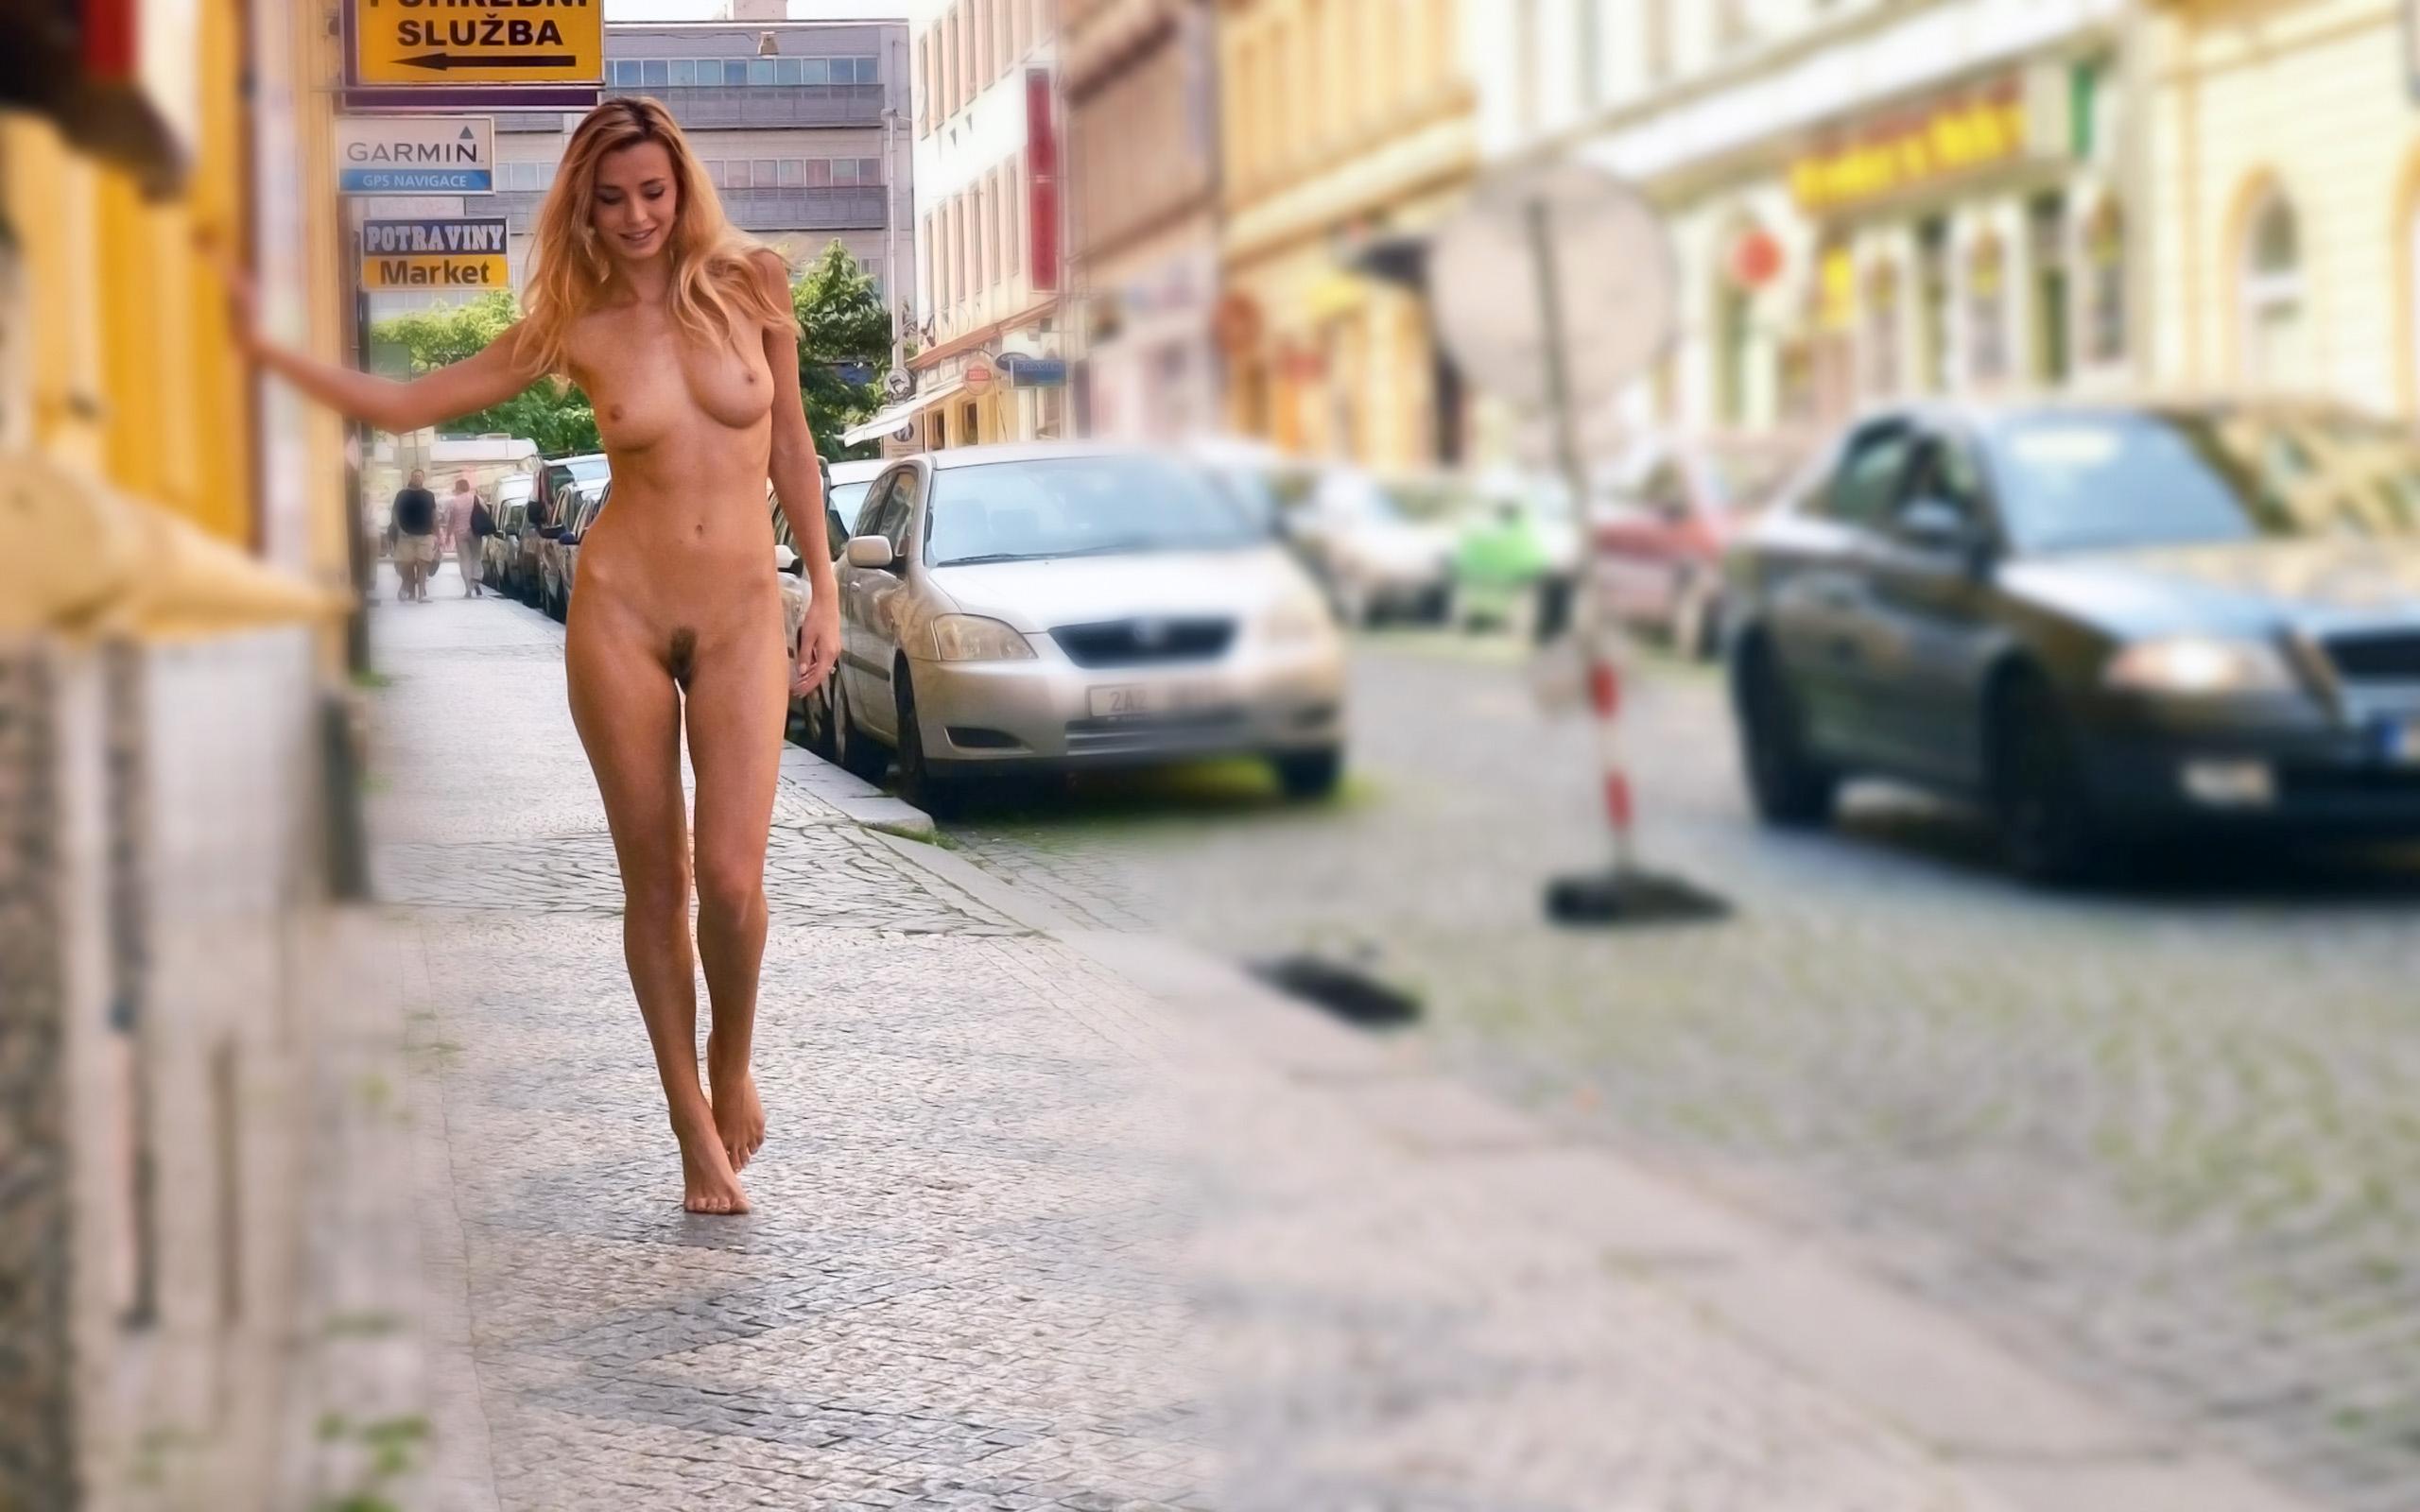 Nude public porn photos